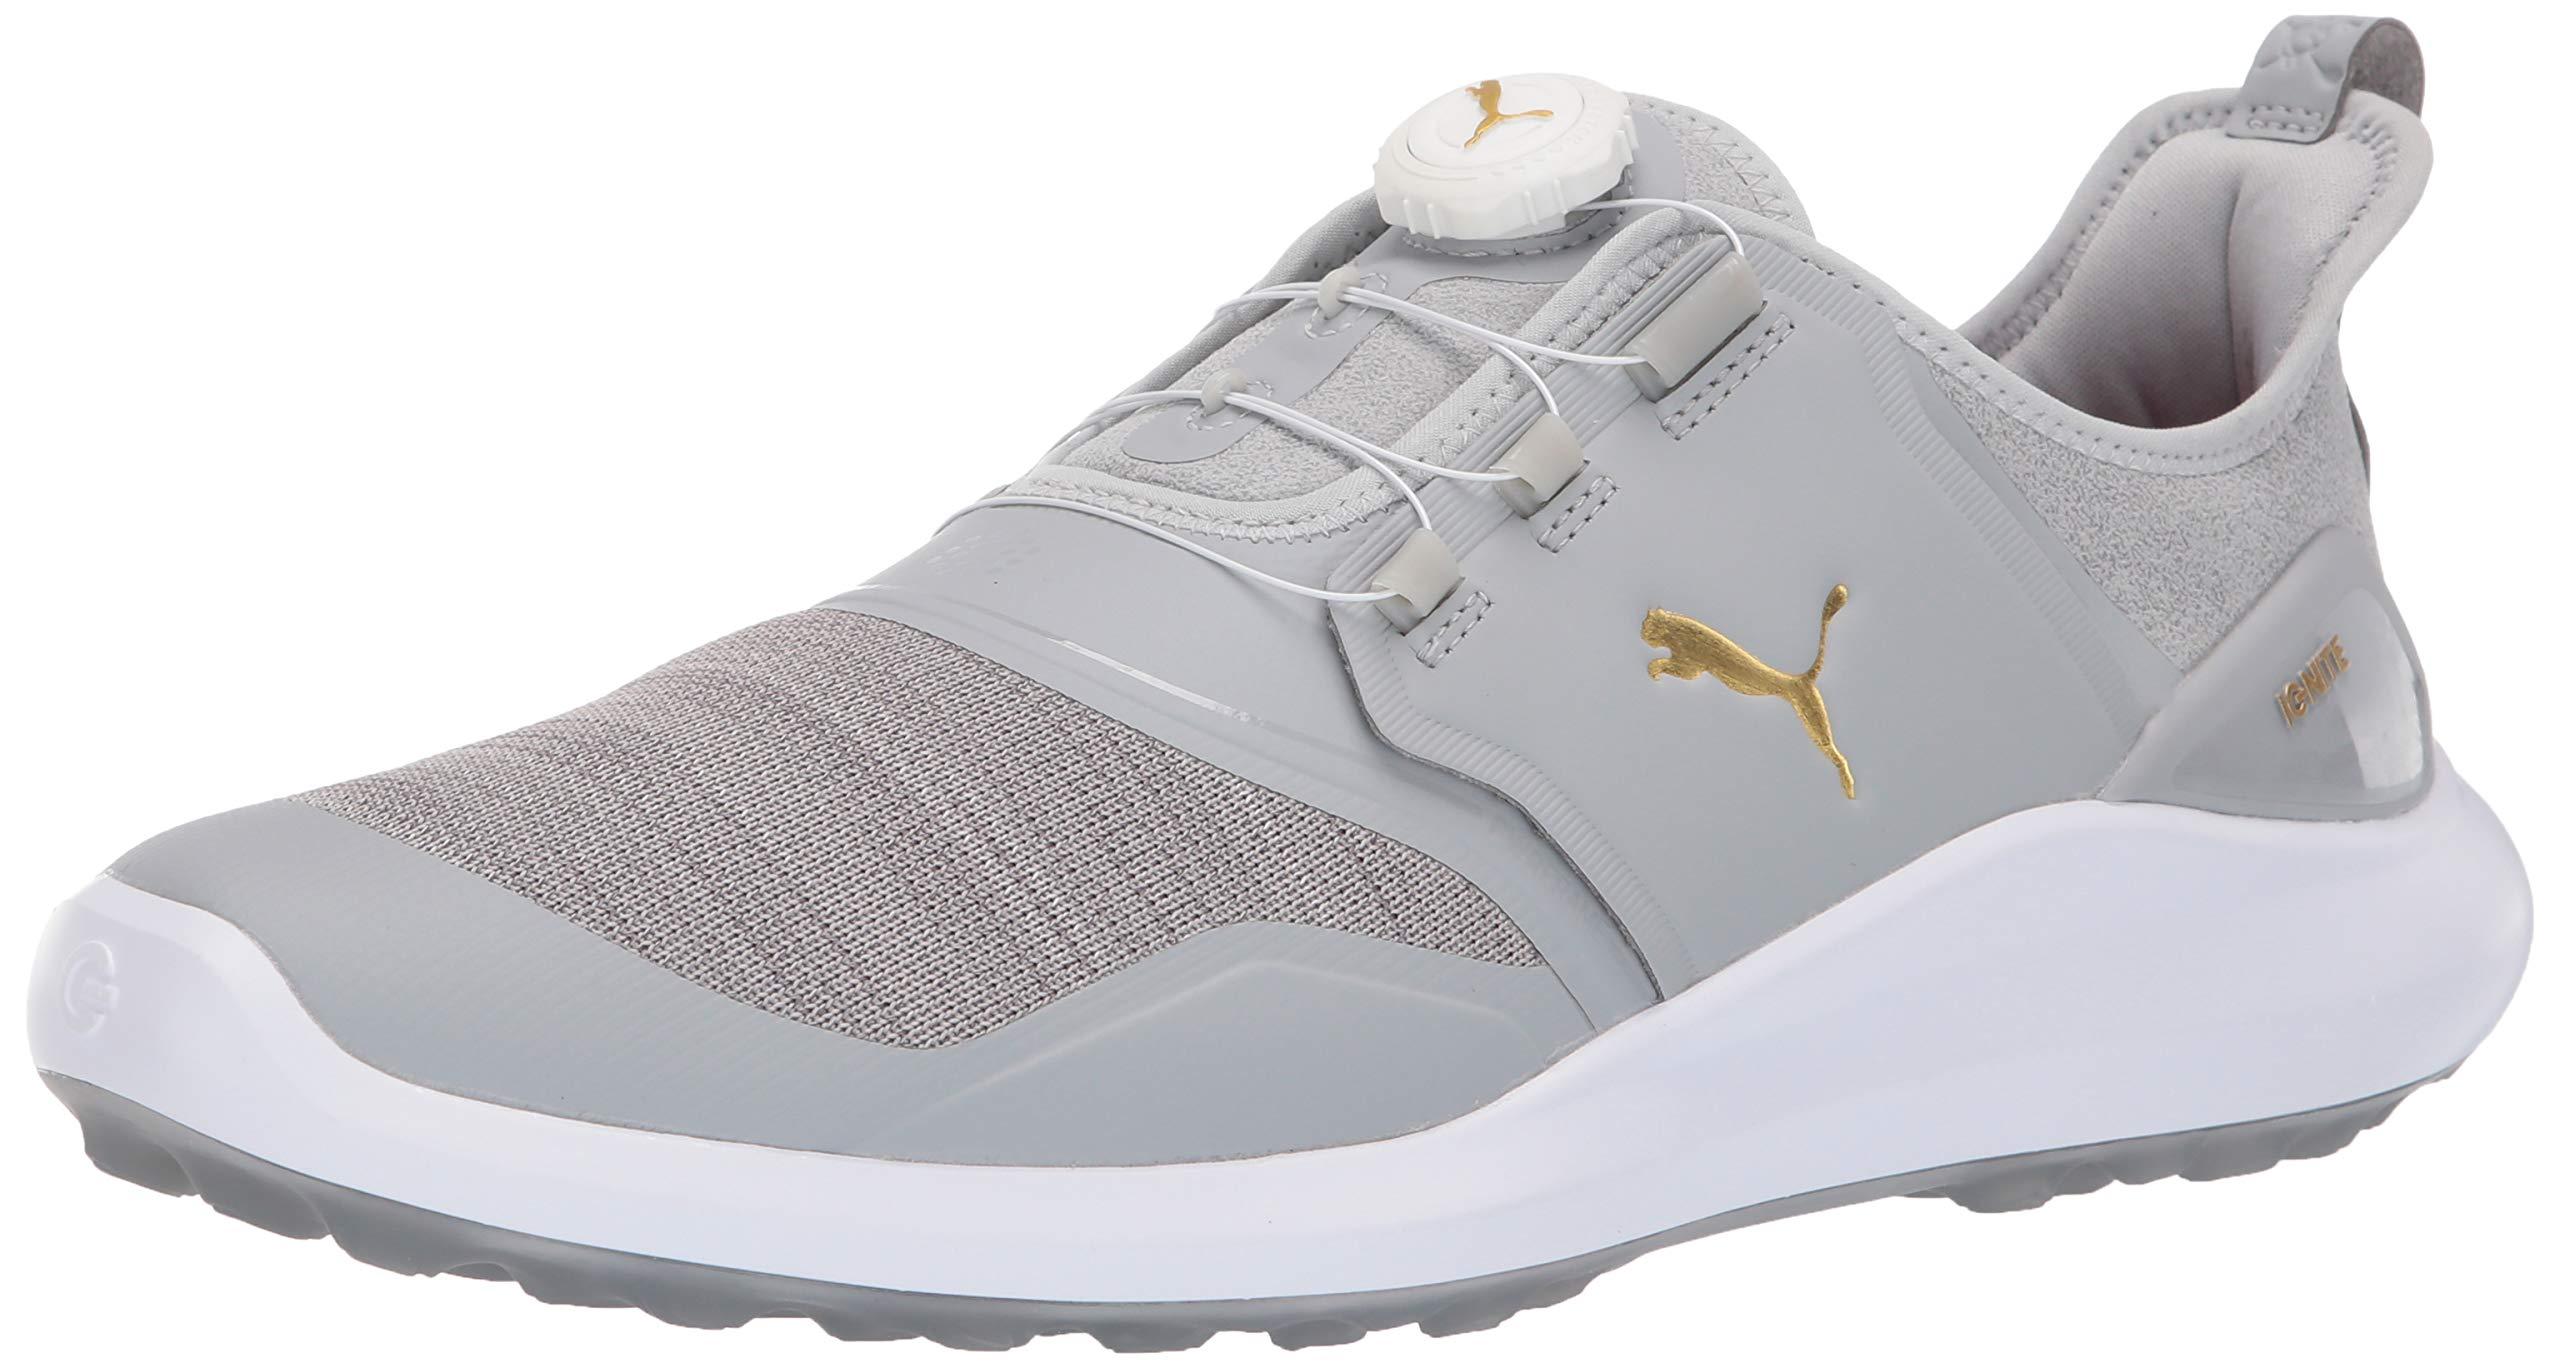 Puma Golf Men S Ignite Nxt Disc Golf Shoe High Ri Choose Sz Color Ebay